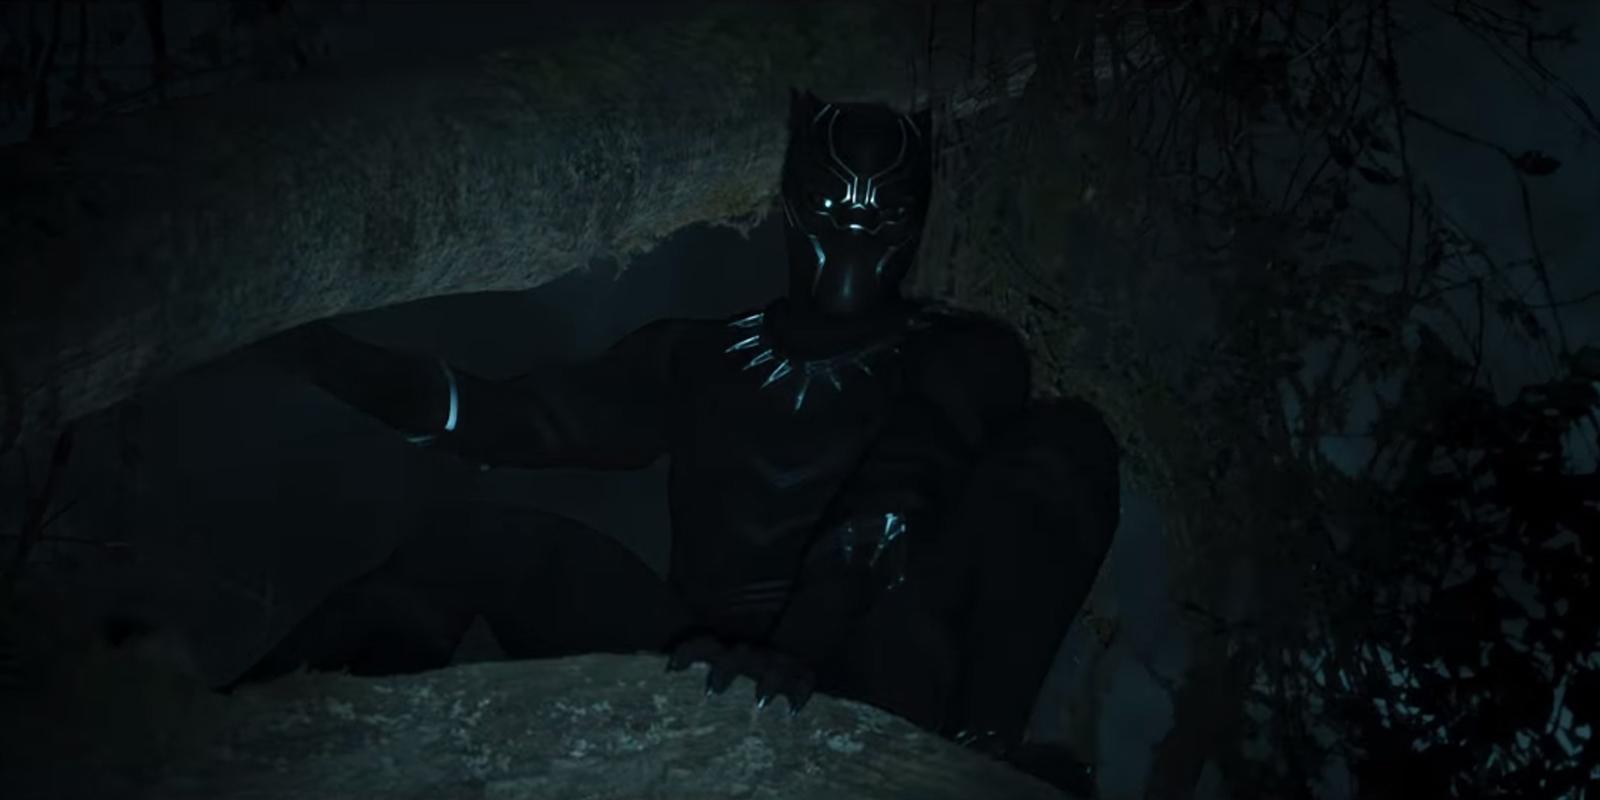 Black Panther 2018 Movie Still Full Hd Wallpaper: Movie Trailer: Black Panther (2018)